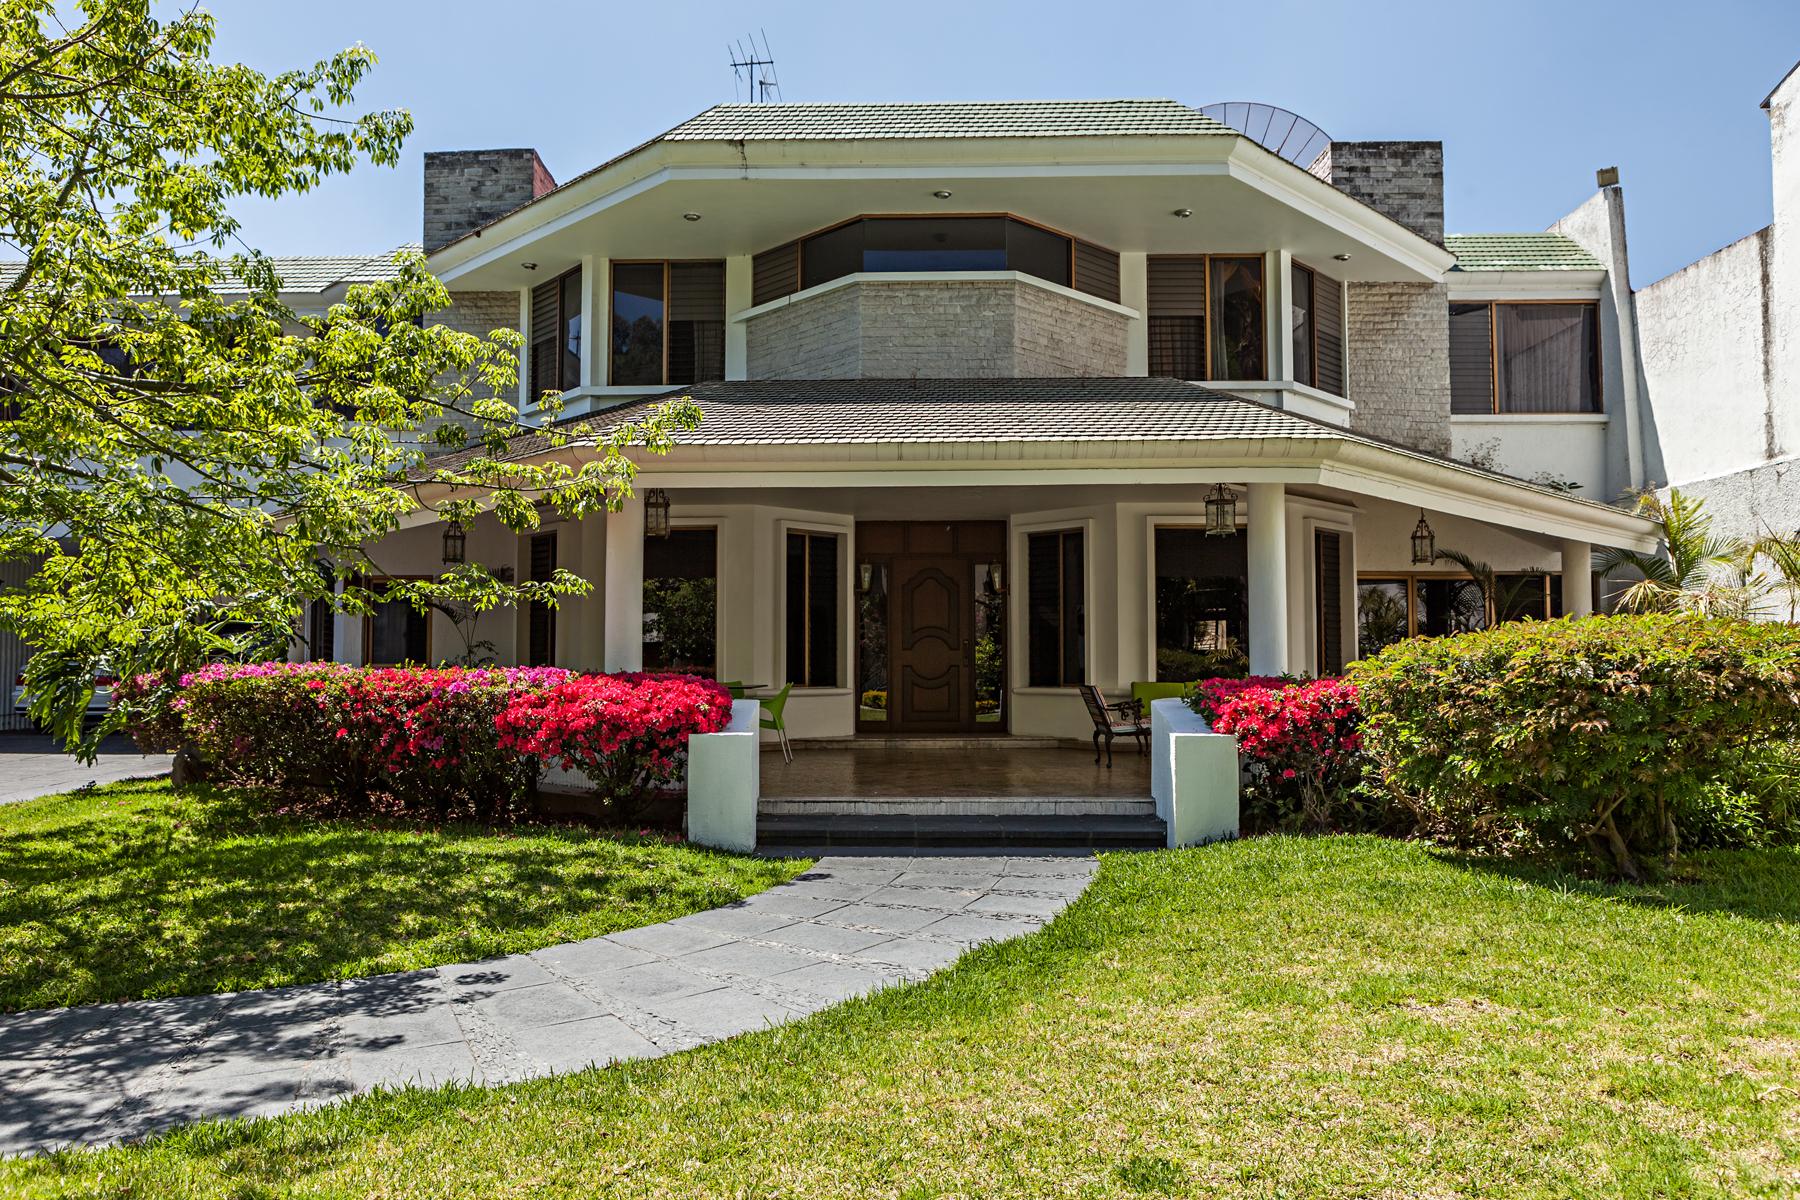 Single Family Home for Sale at Residencia Eca do Queiros, Jard Universidad, Zapopan Guadalajara, 45110 Mexico